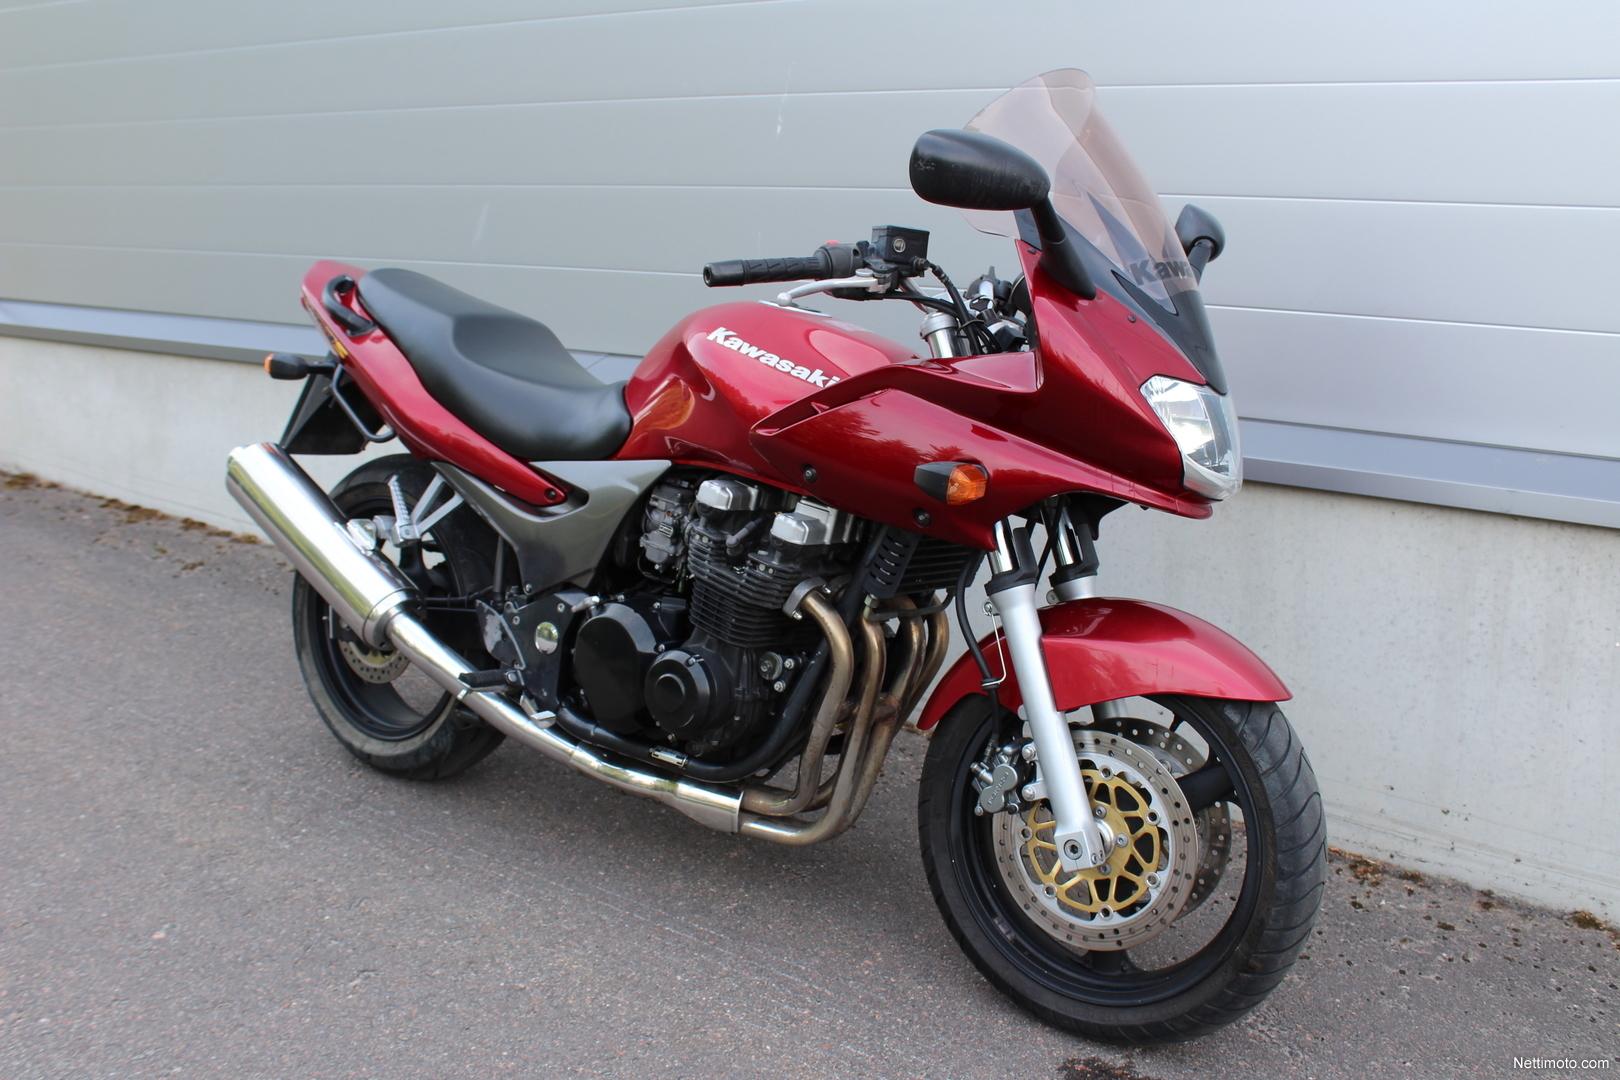 Kawasaki 750 ZR-7 S 2004 - Galerie moto - MOTOPLANETE